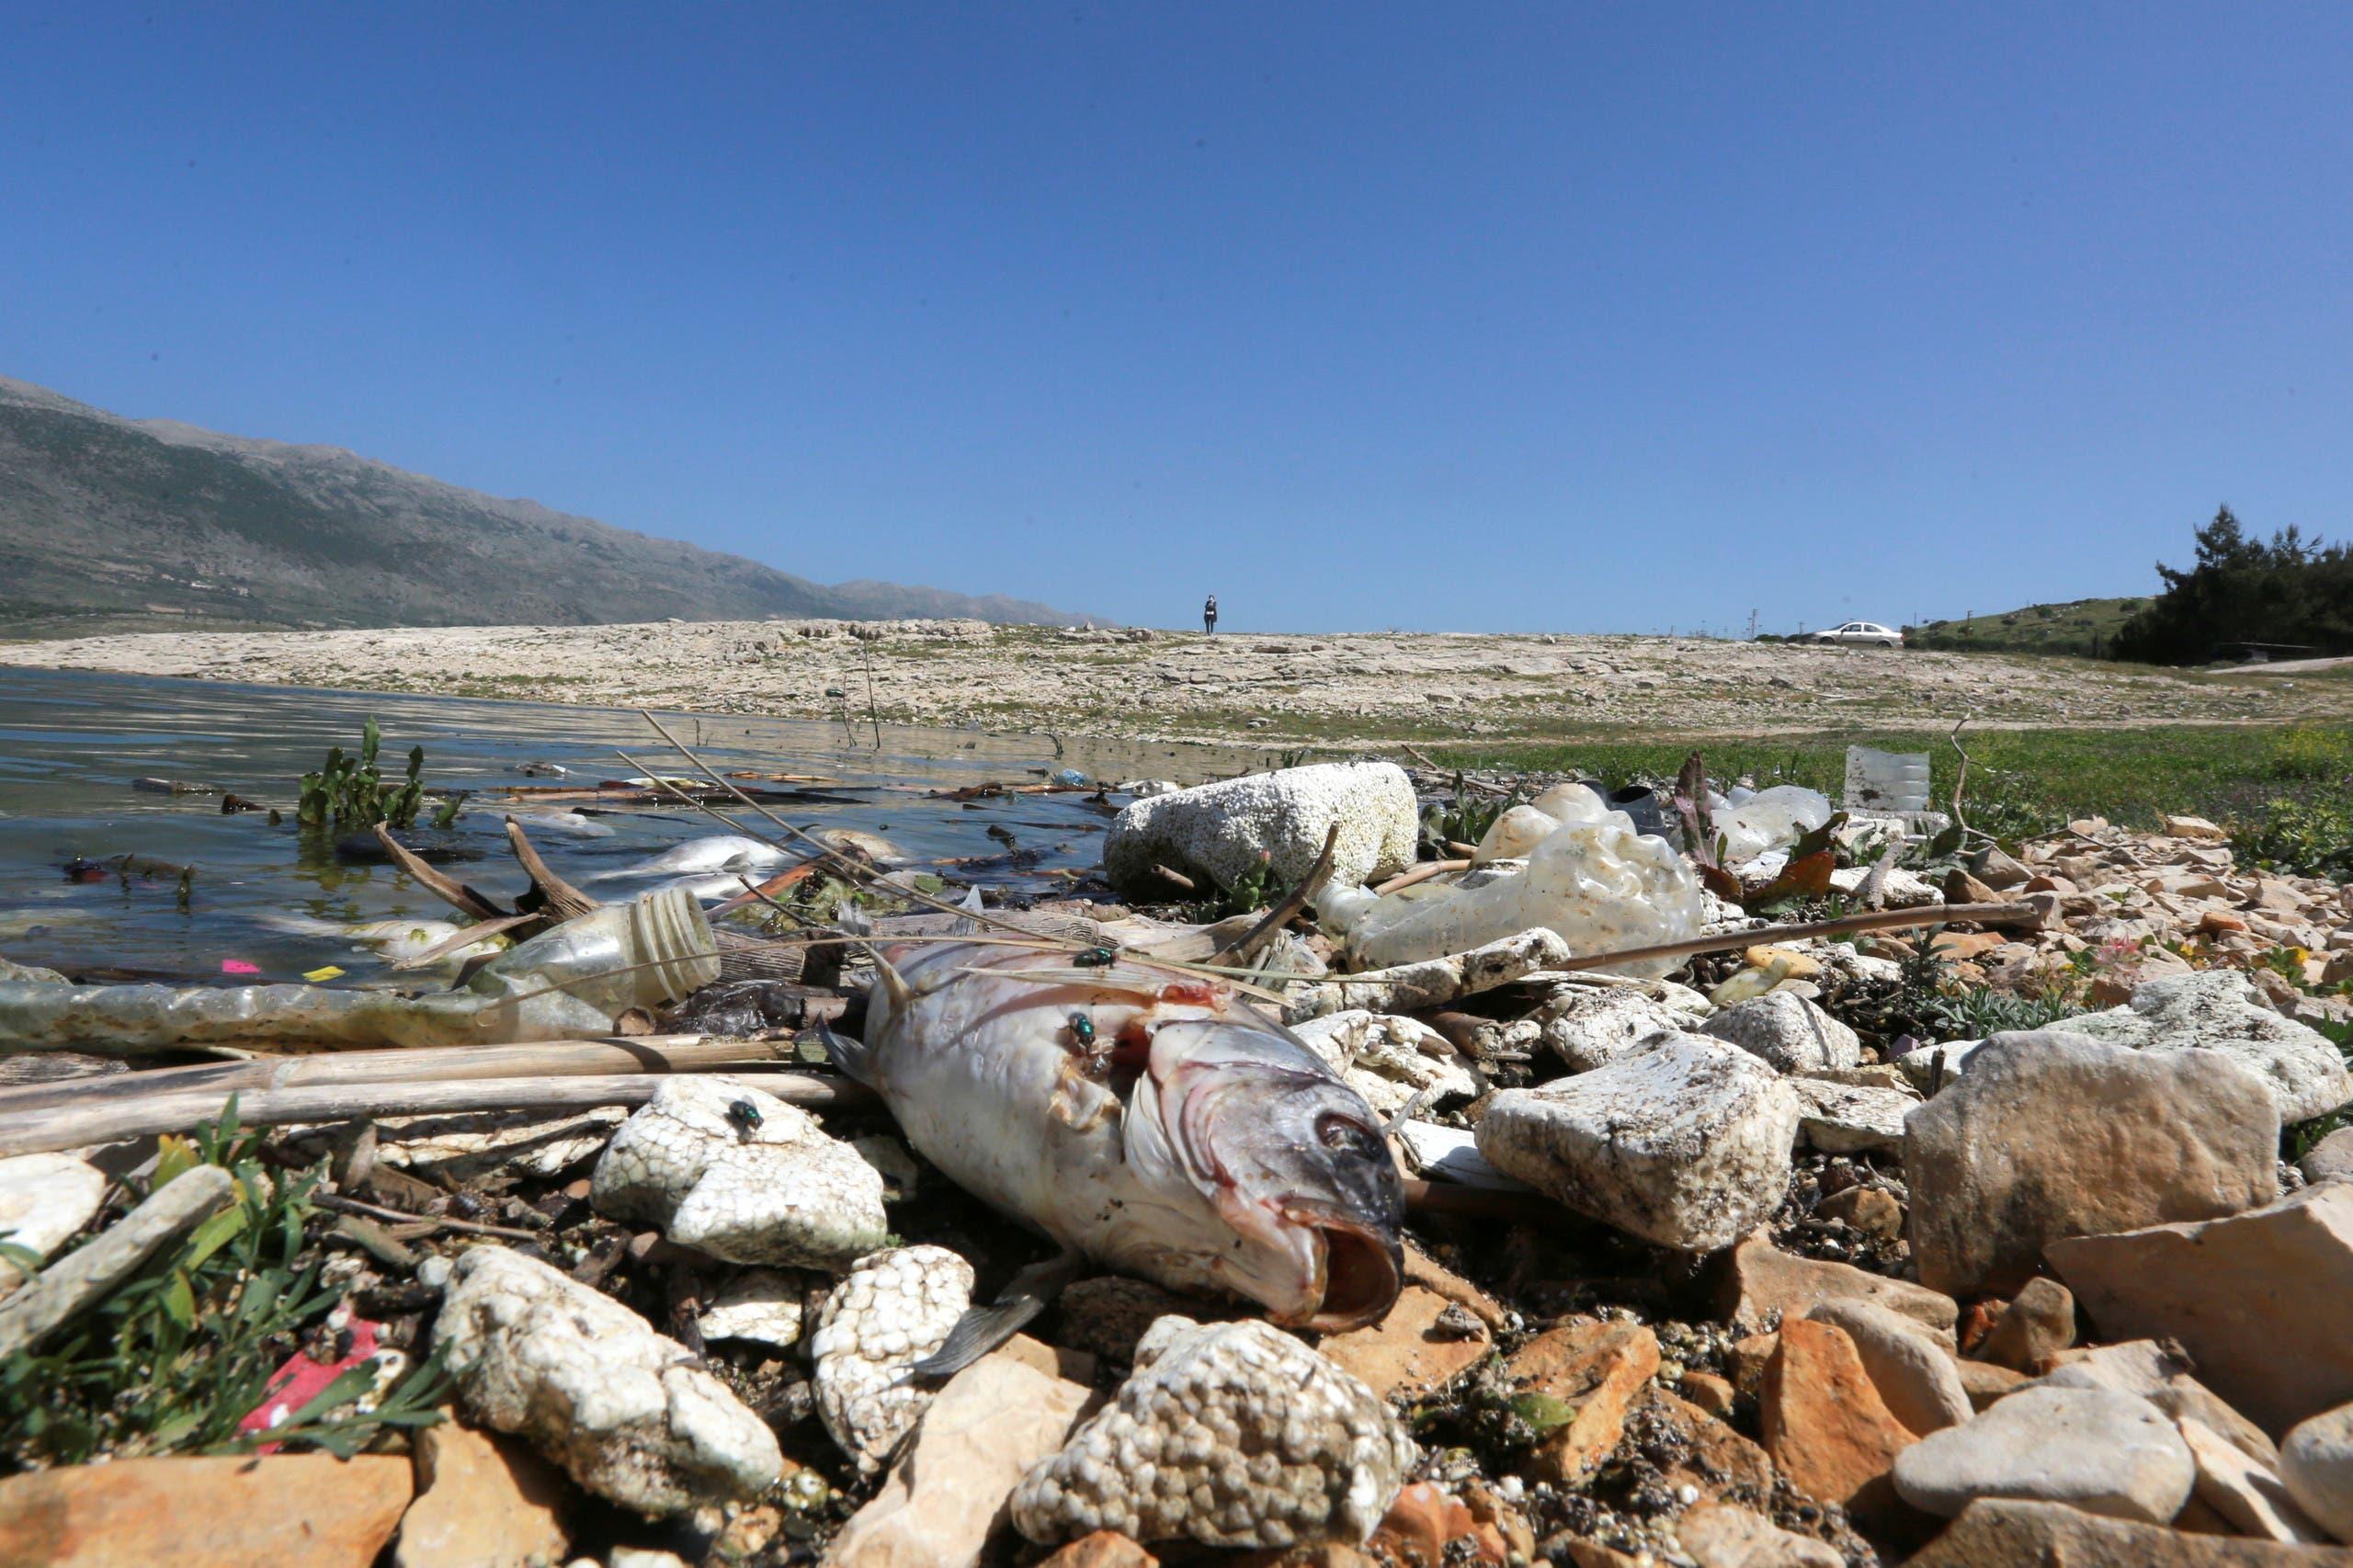 A dead fish is seen at the shore of Lake Qaraoun on the Litani River, Lebanon April 29, 2021. (Reuters)